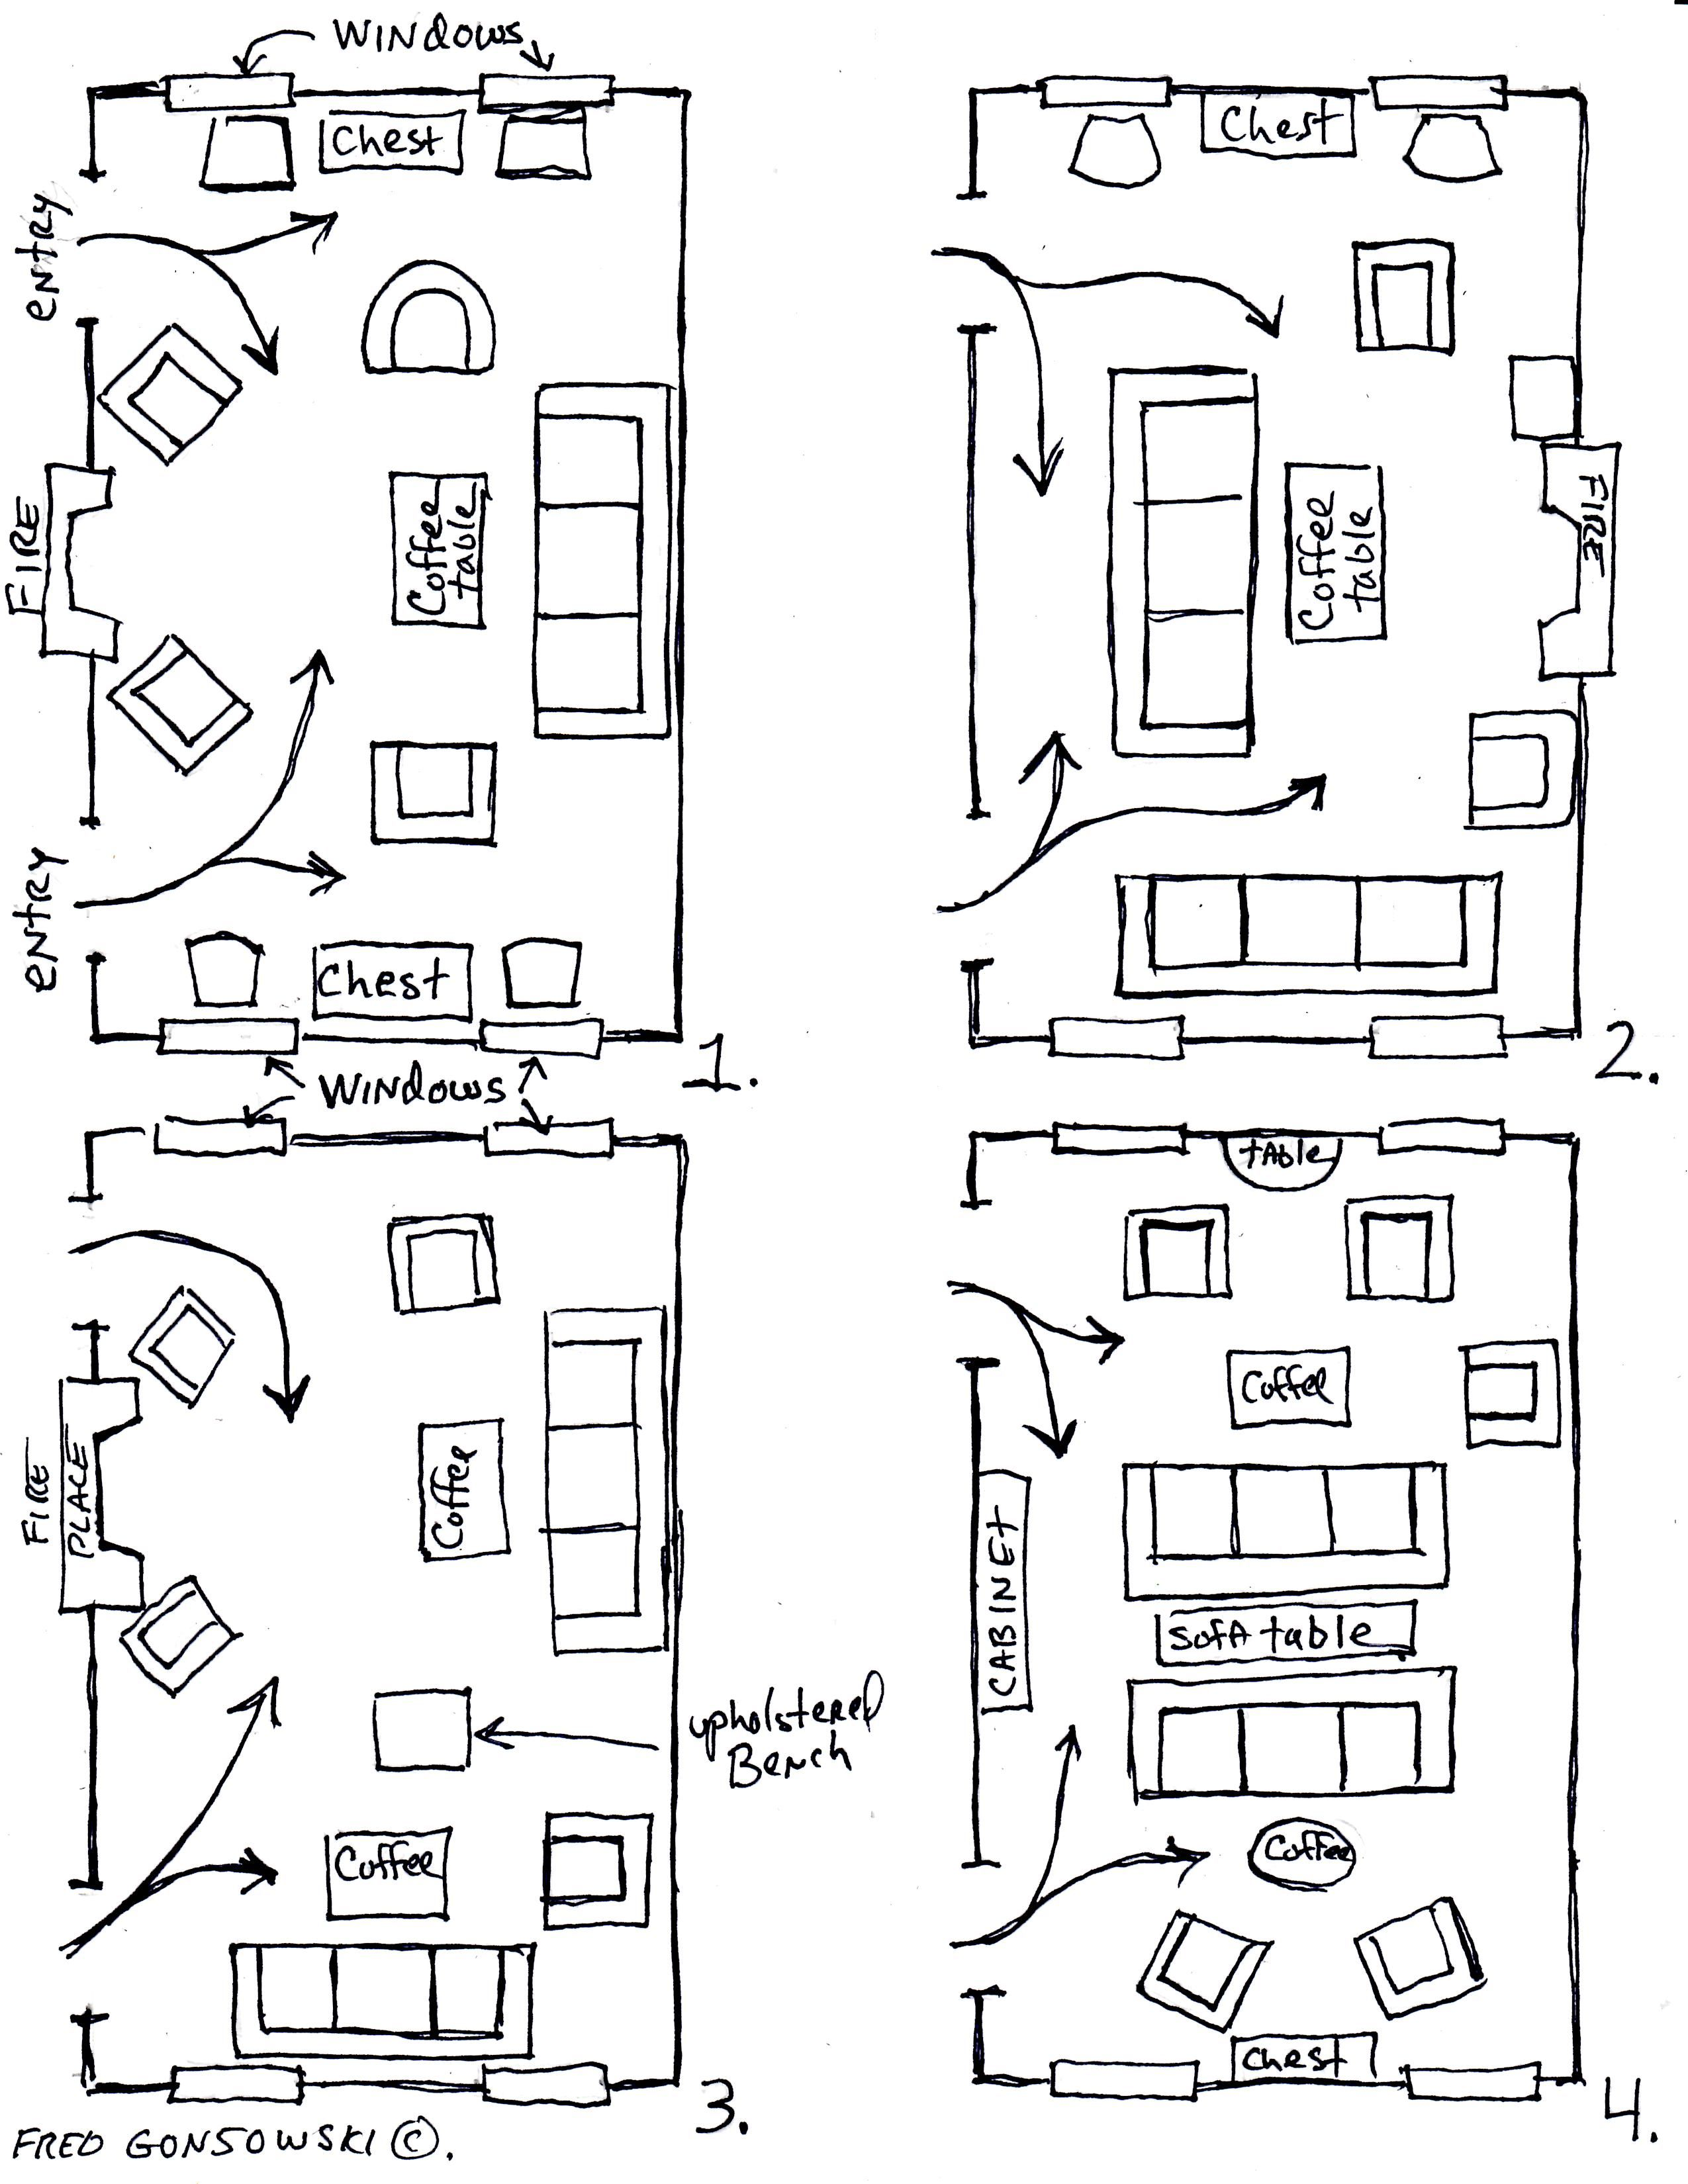 Arranging furniture TWELVE different ways in the Same Room Fred